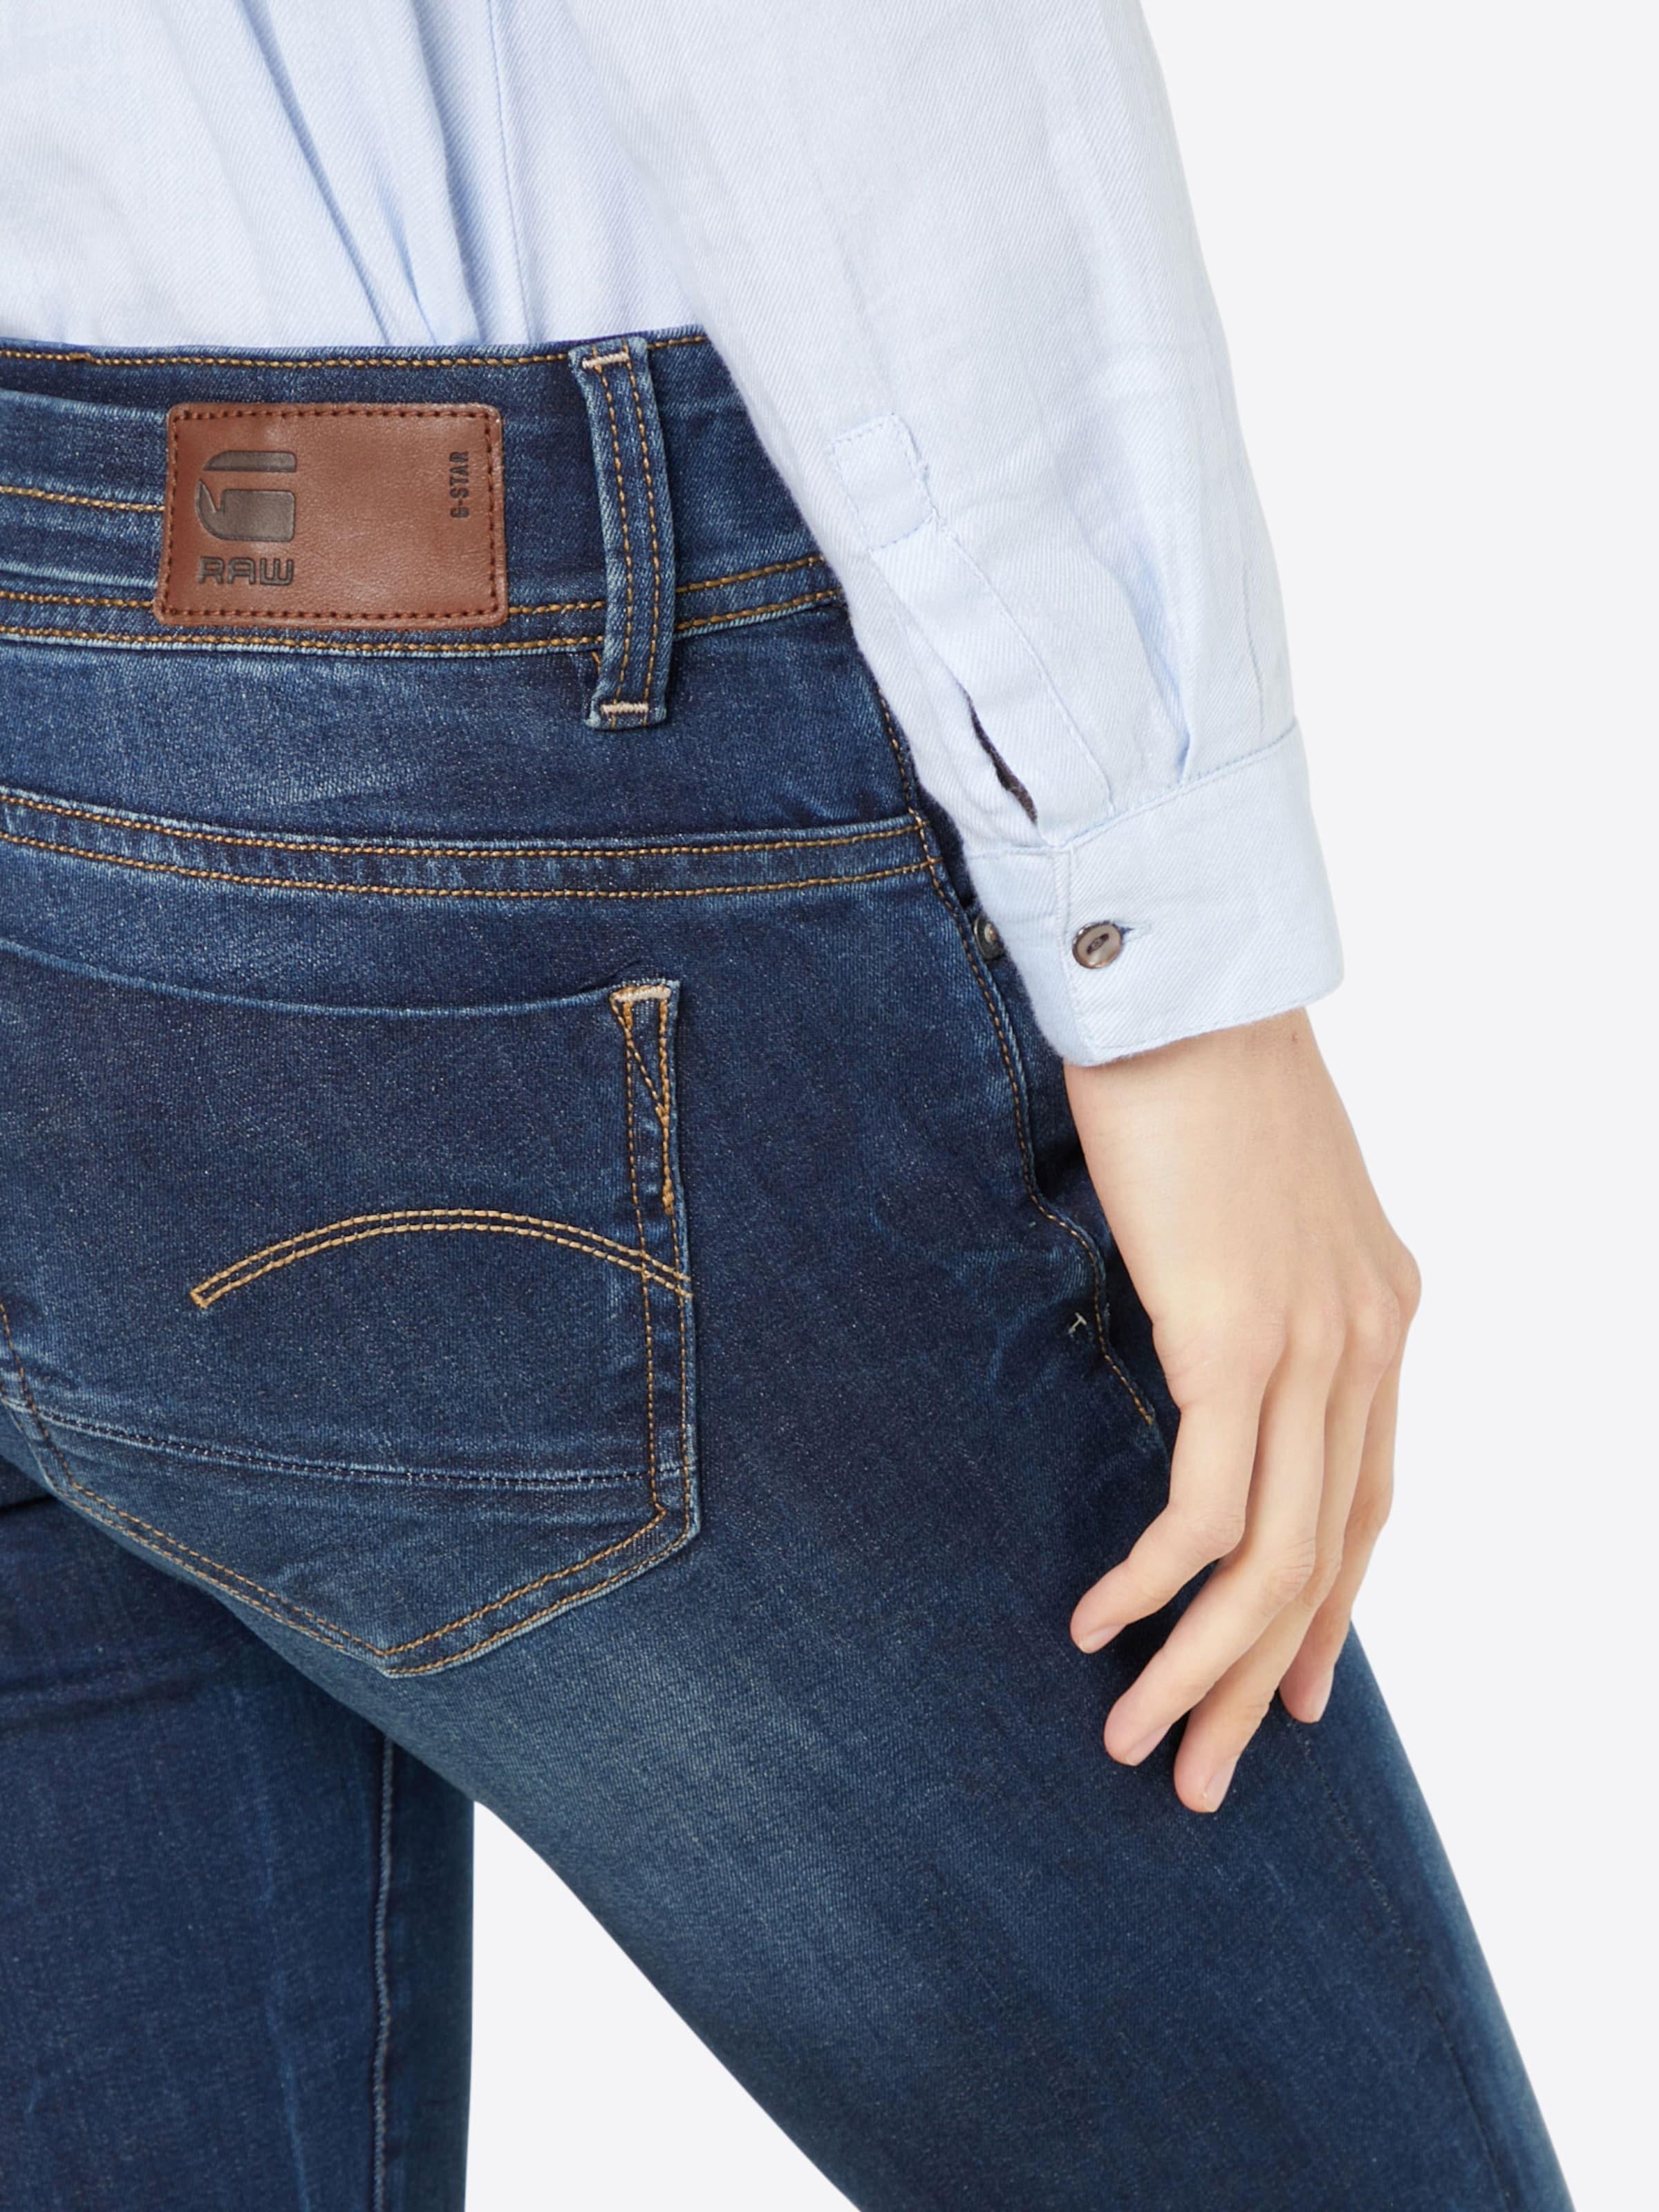 G-STAR RAW 'Midge Saddle Mid Straight' Jeans Preiswert Js4jPG3LV